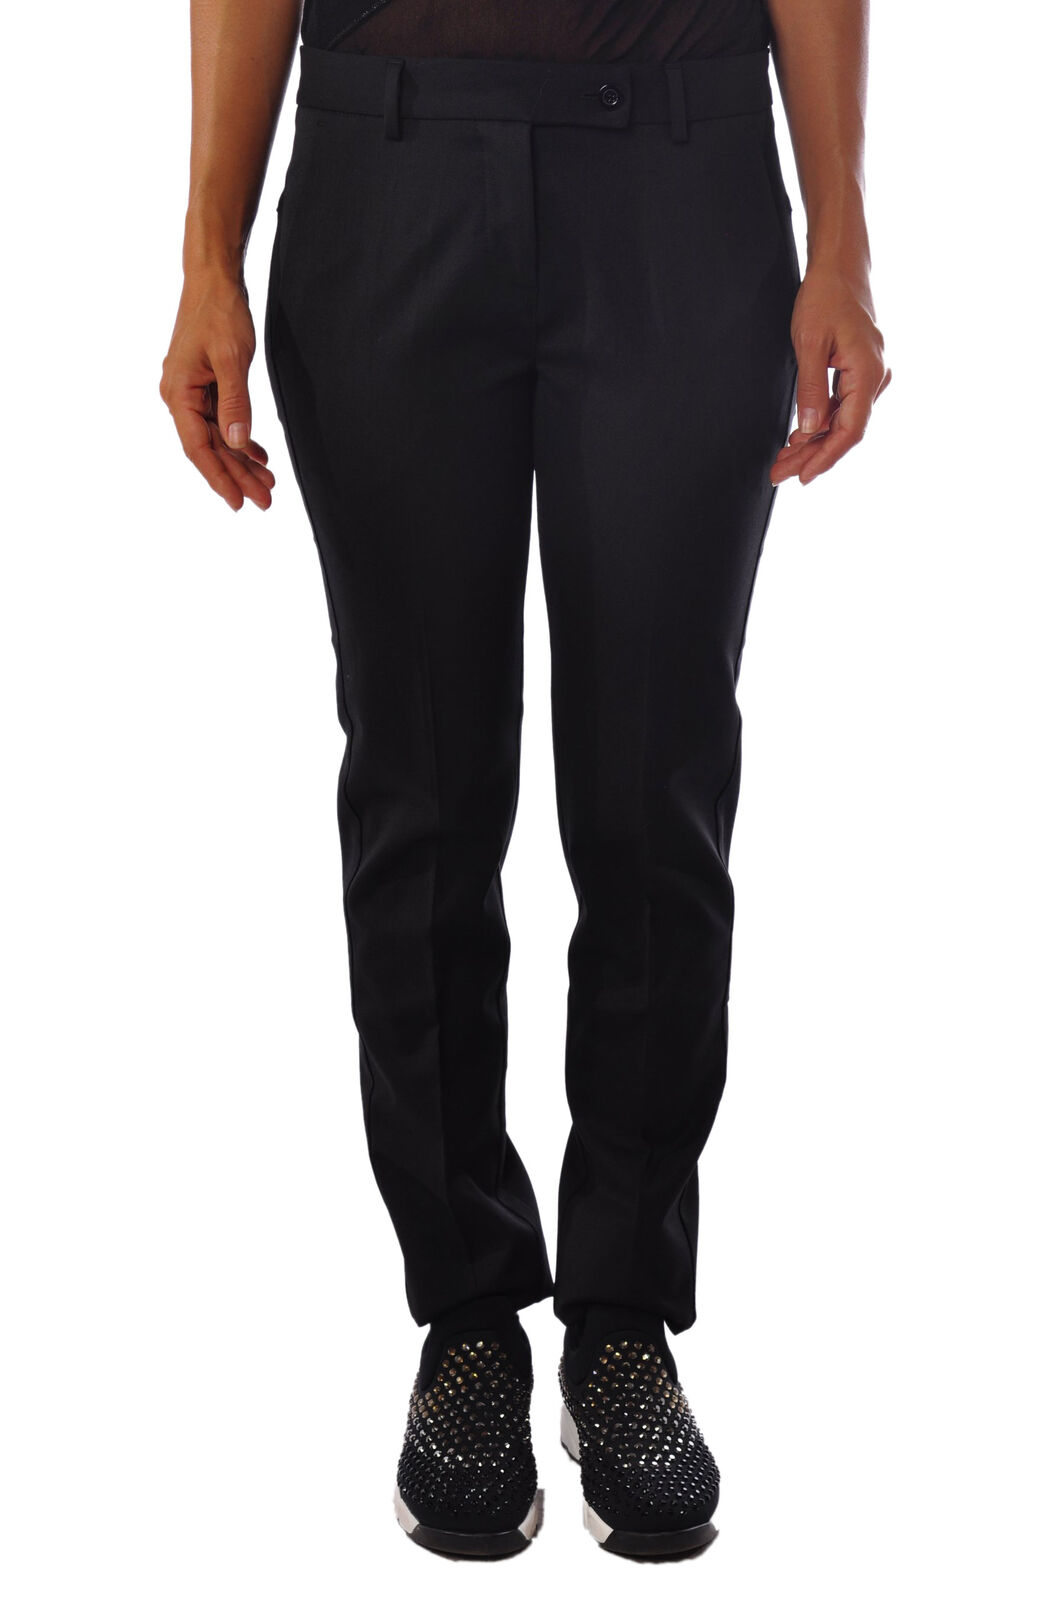 Meme-Pantalones-Pantalones-Mujer  - Negro - 914618C181440  mejor oferta